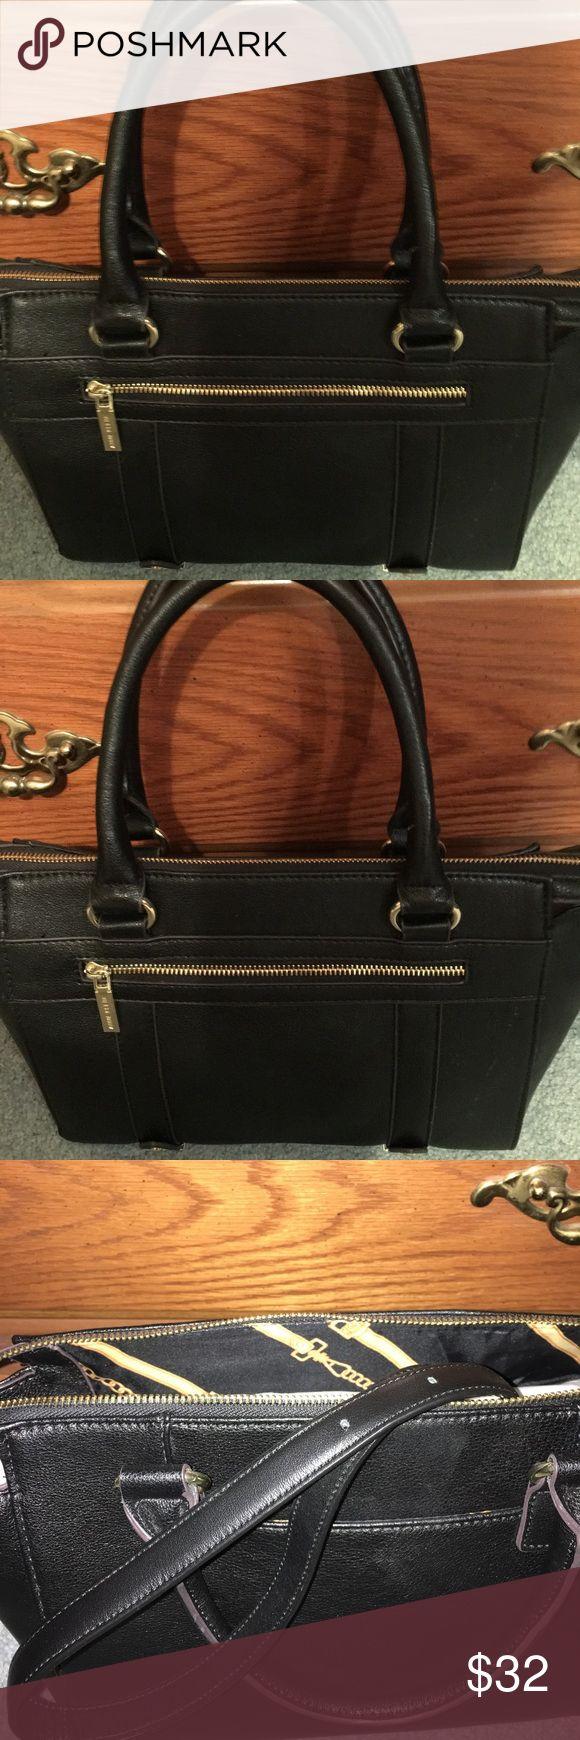 tignanello handbag tignanello handbag with strap Tignanello Bags Shoulder Bags